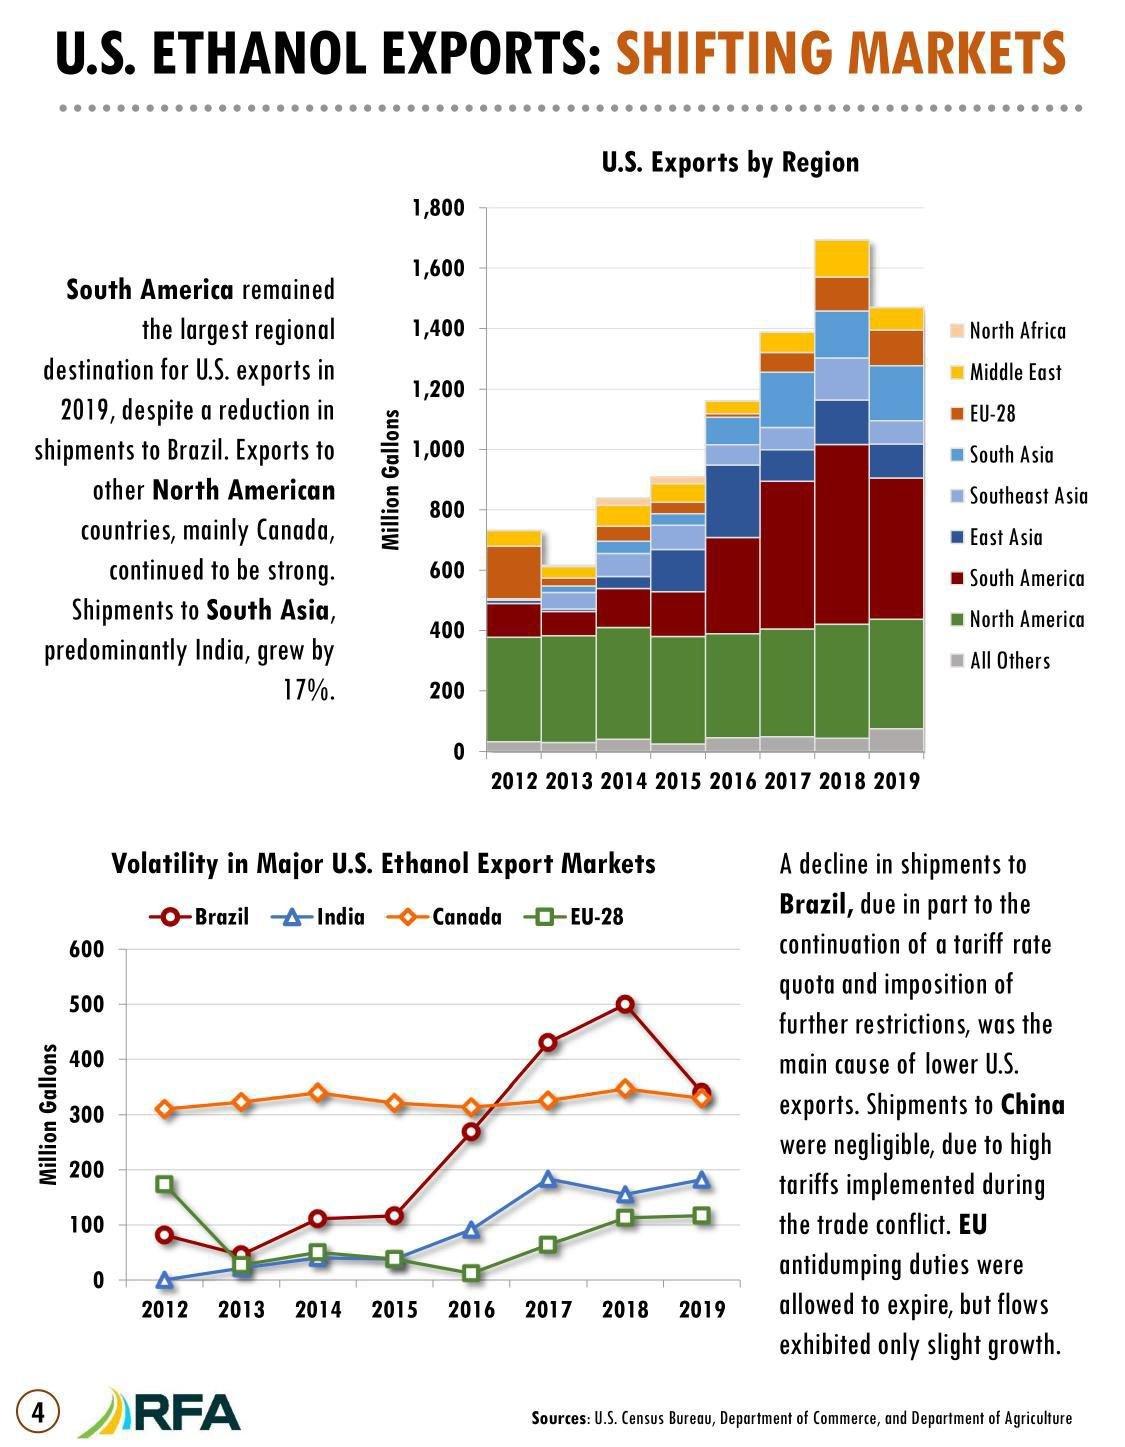 U.S. Ethanol Exports -- Shifting Markets